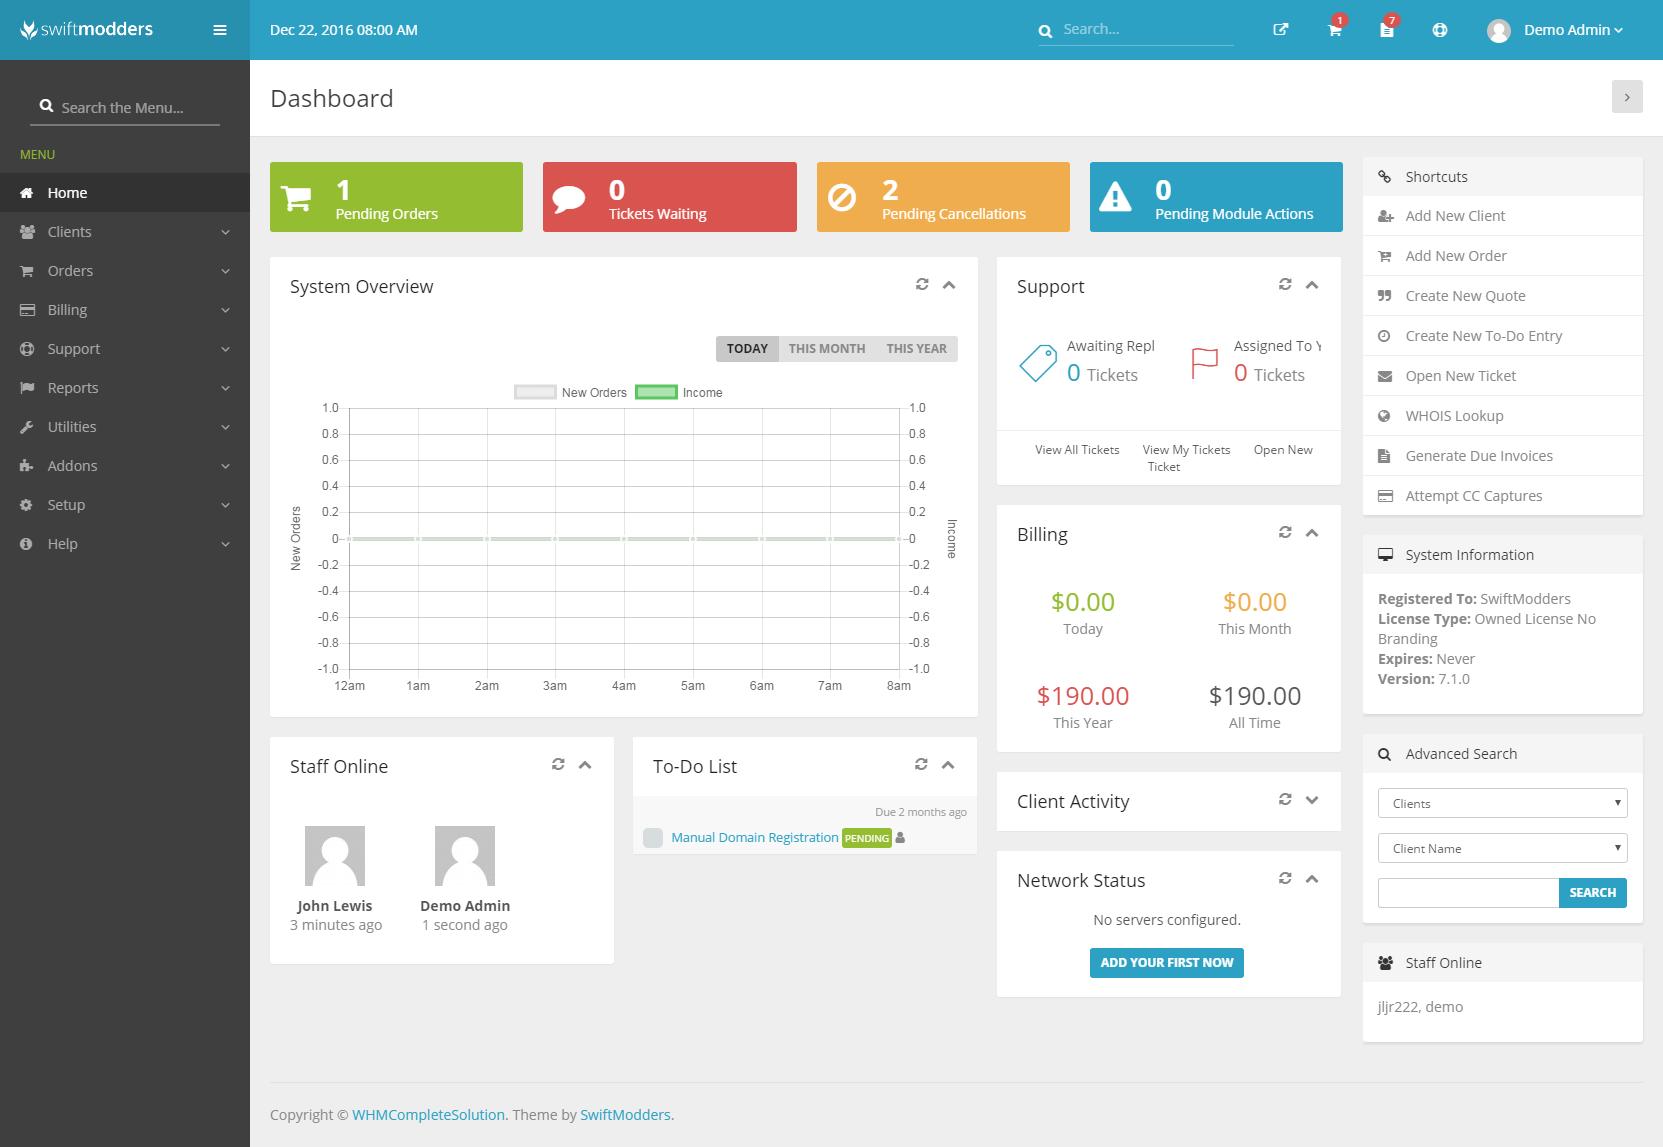 SwiftModders WHMCS Admin Theme - WHMCS Marketplace